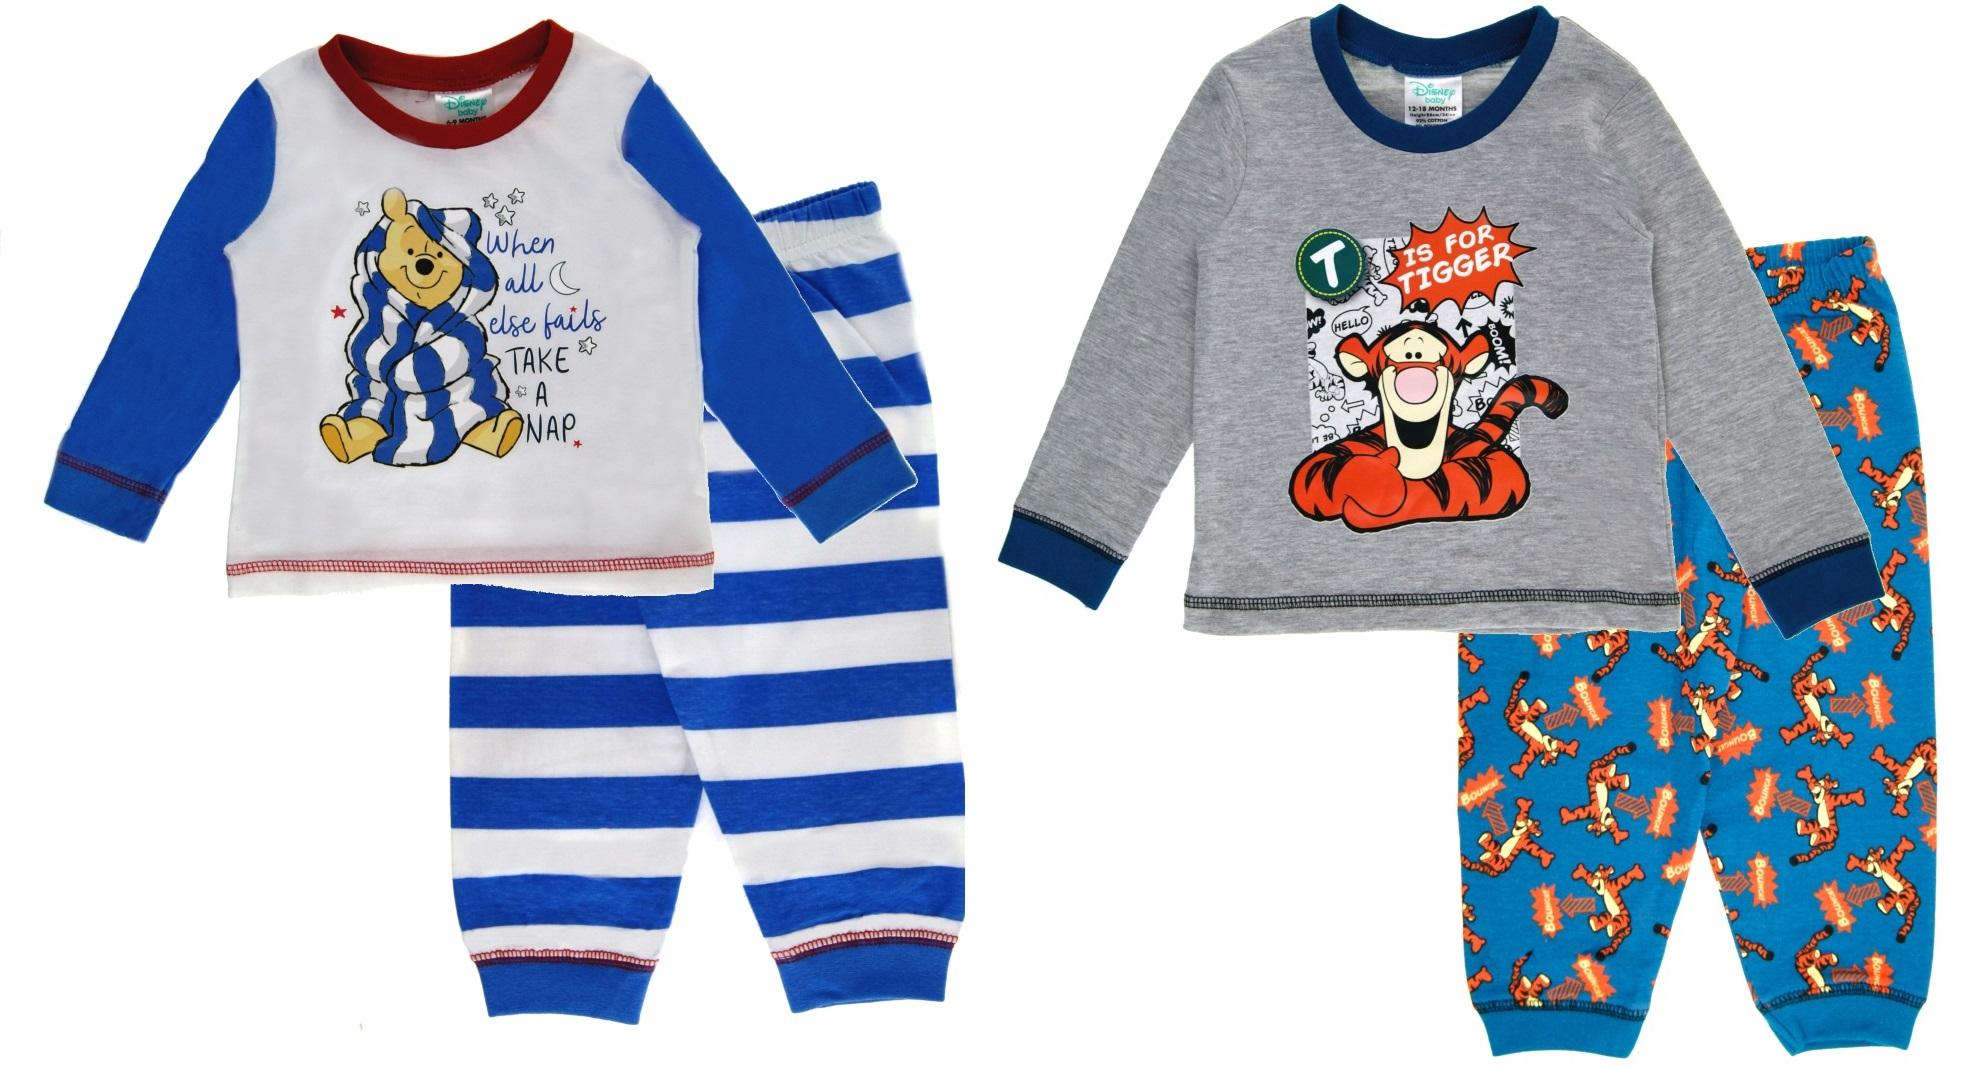 When All Else Fails Take a Nap Disneys Winnie The Pooh Baby Boy Pyjamas!